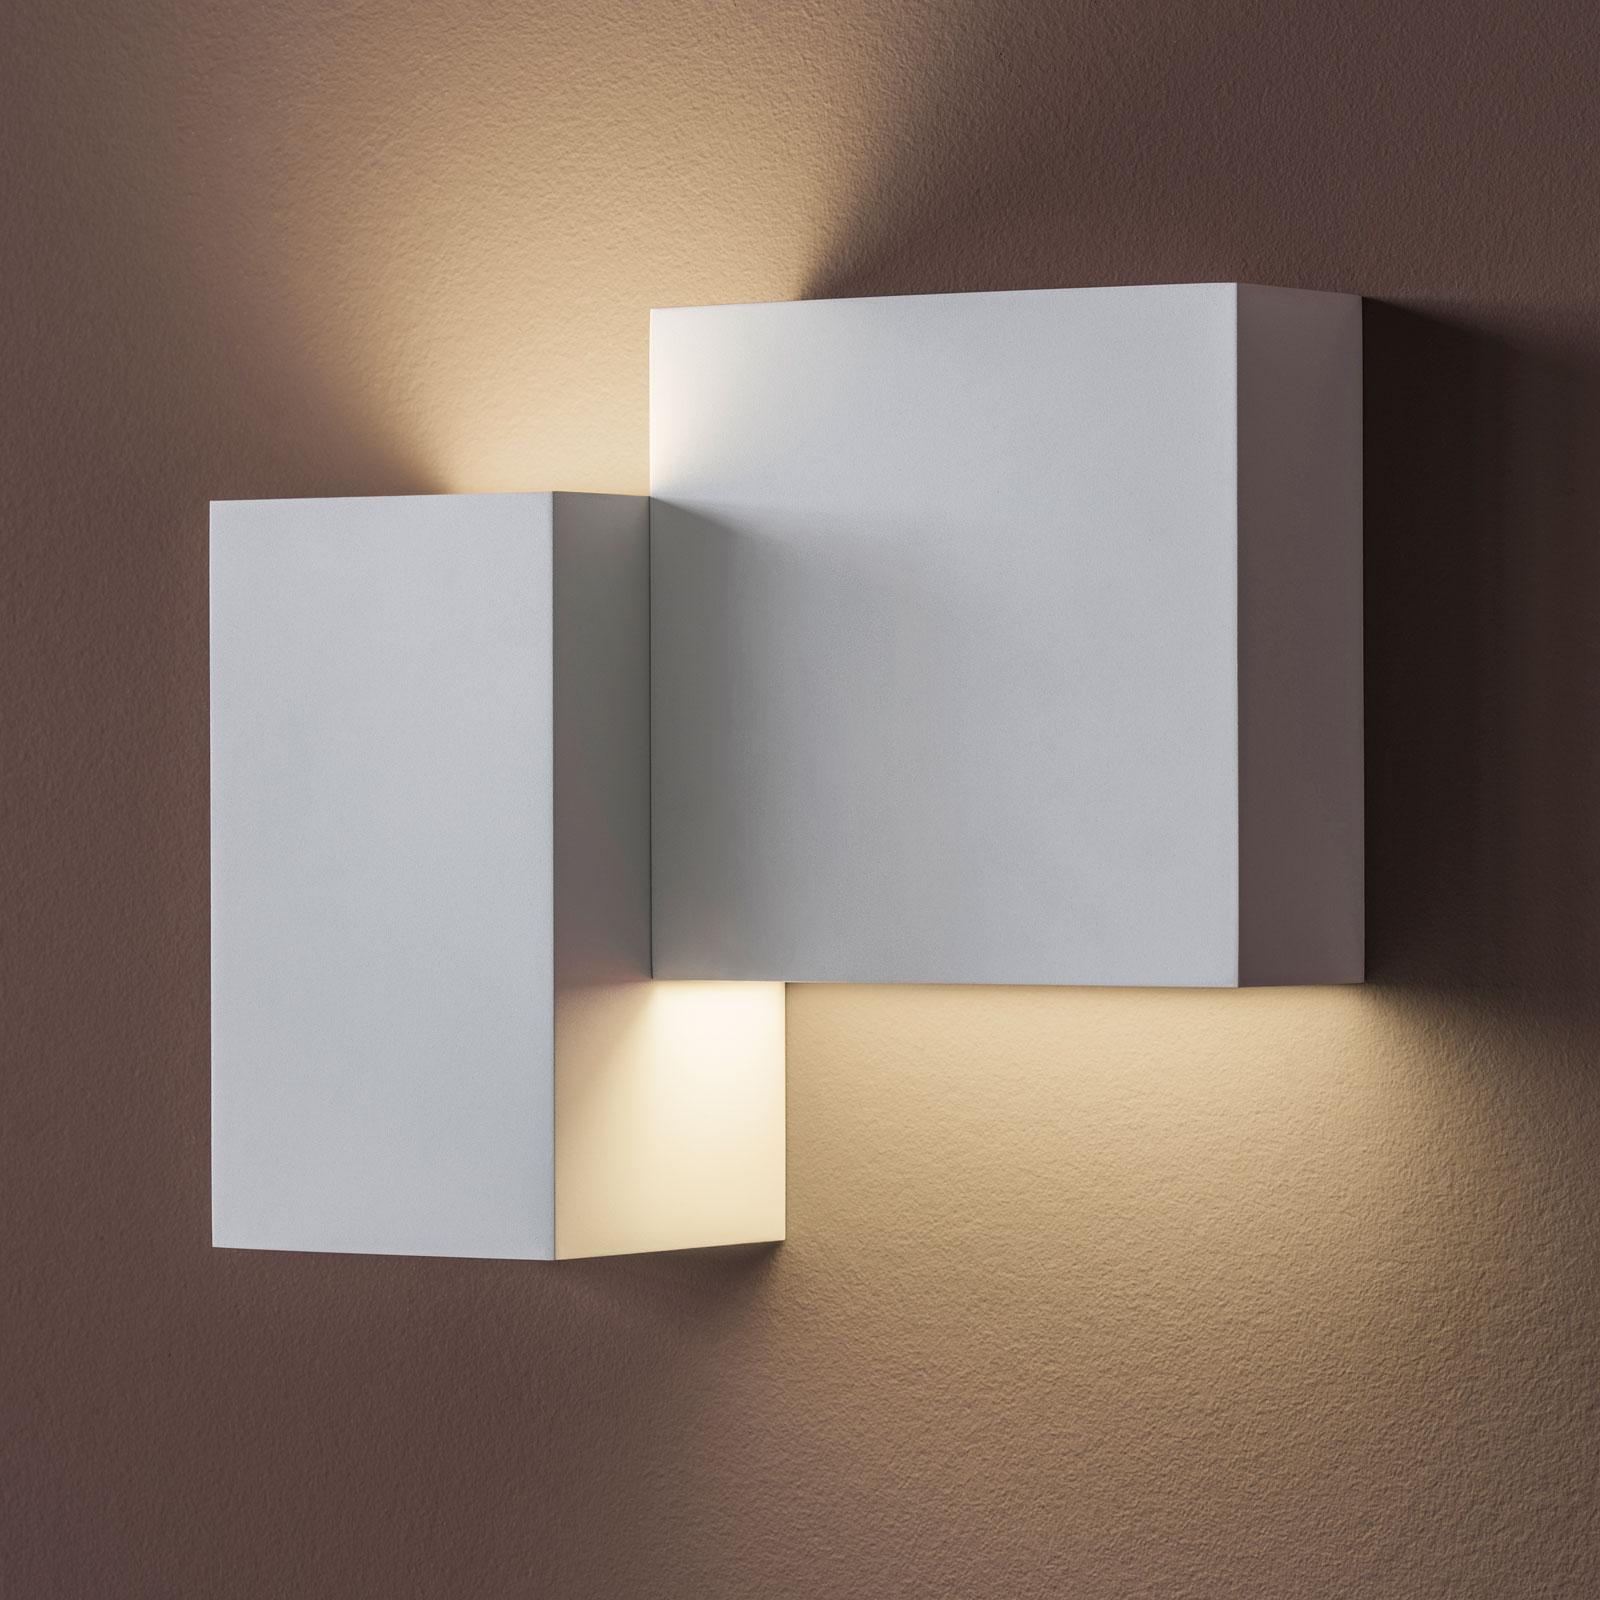 Acquista Vibia Structural 2602 applique LED